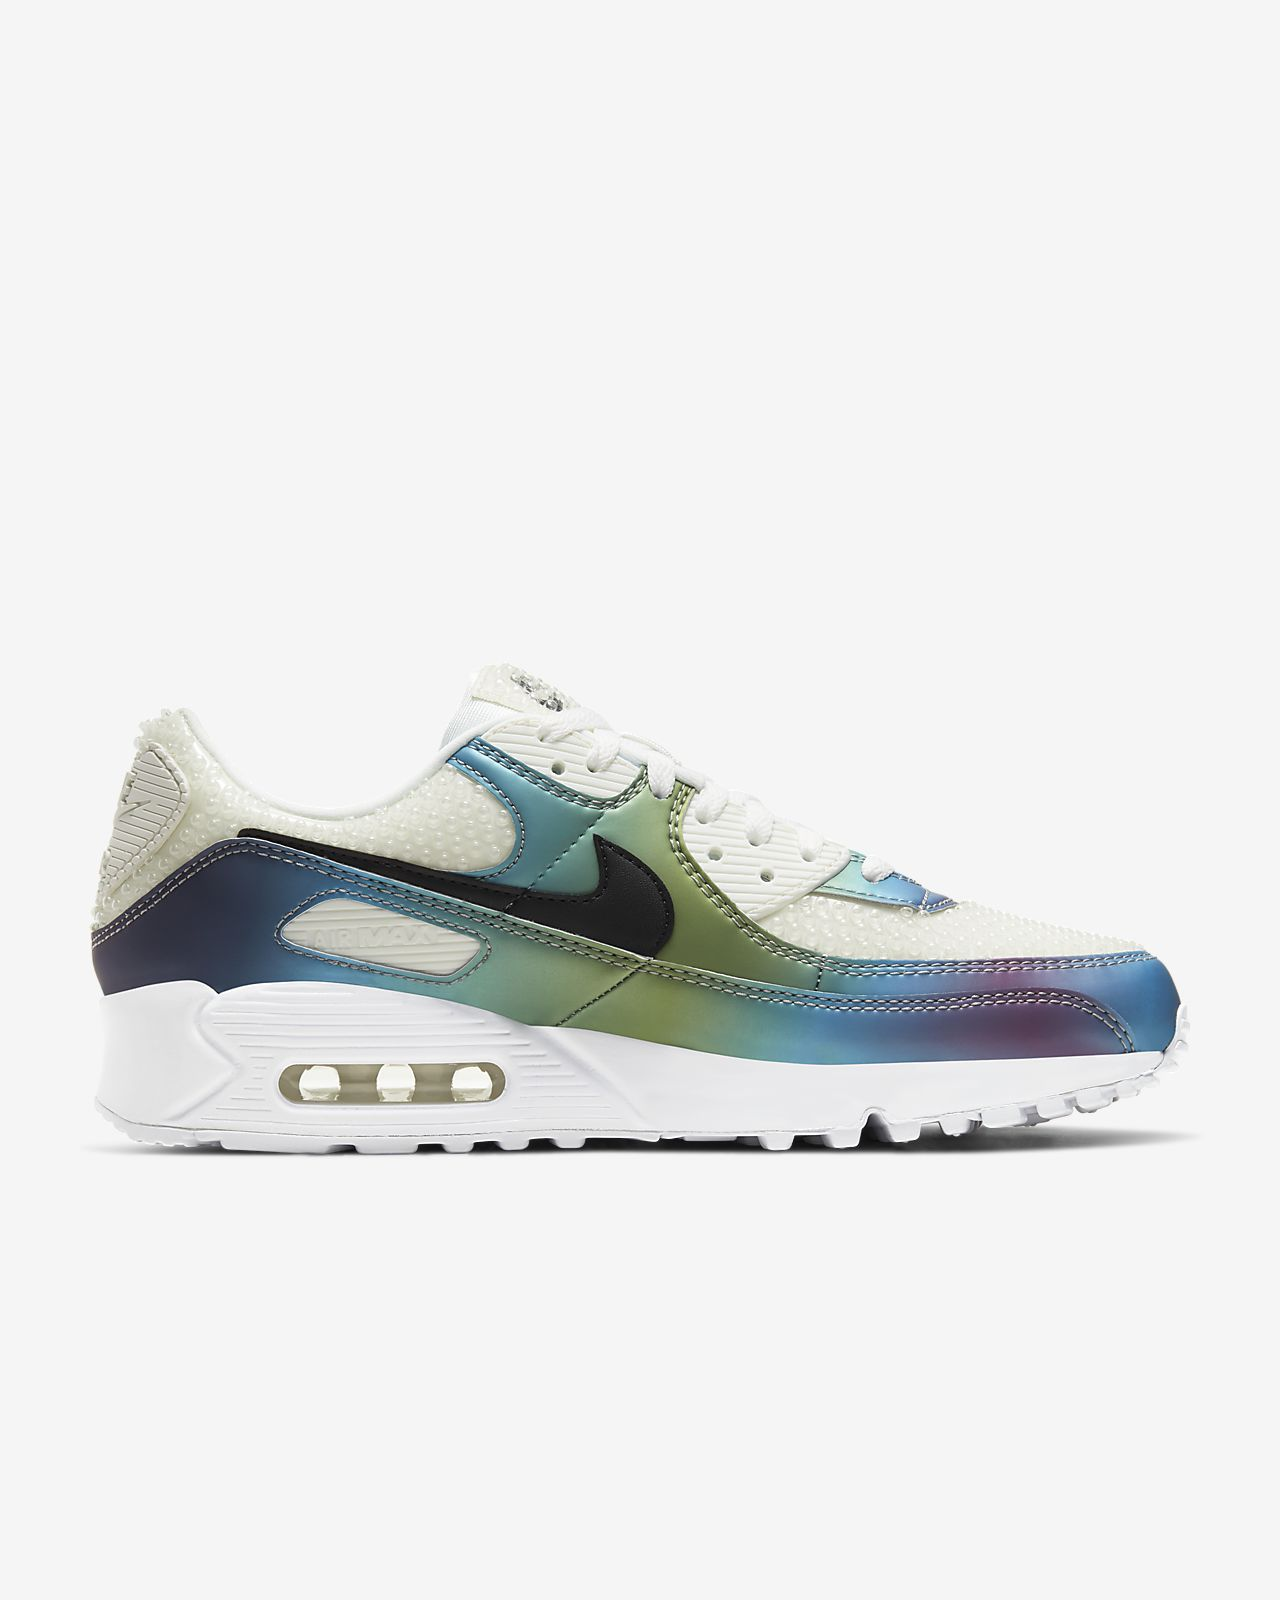 Nike Air Max 90 Premium Summit White | Sneakerdiscounter.nl